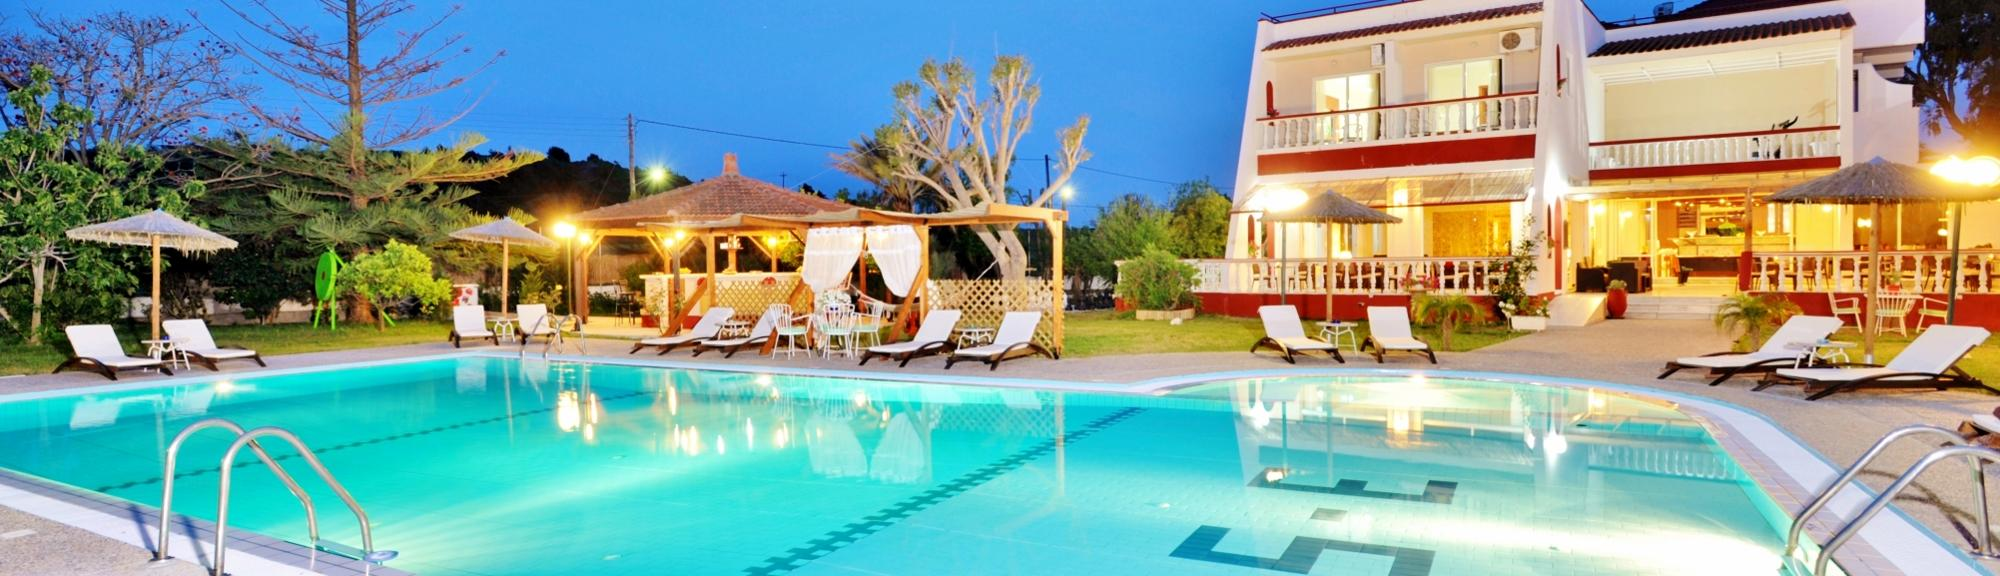 Naturist Angel Club Hotel